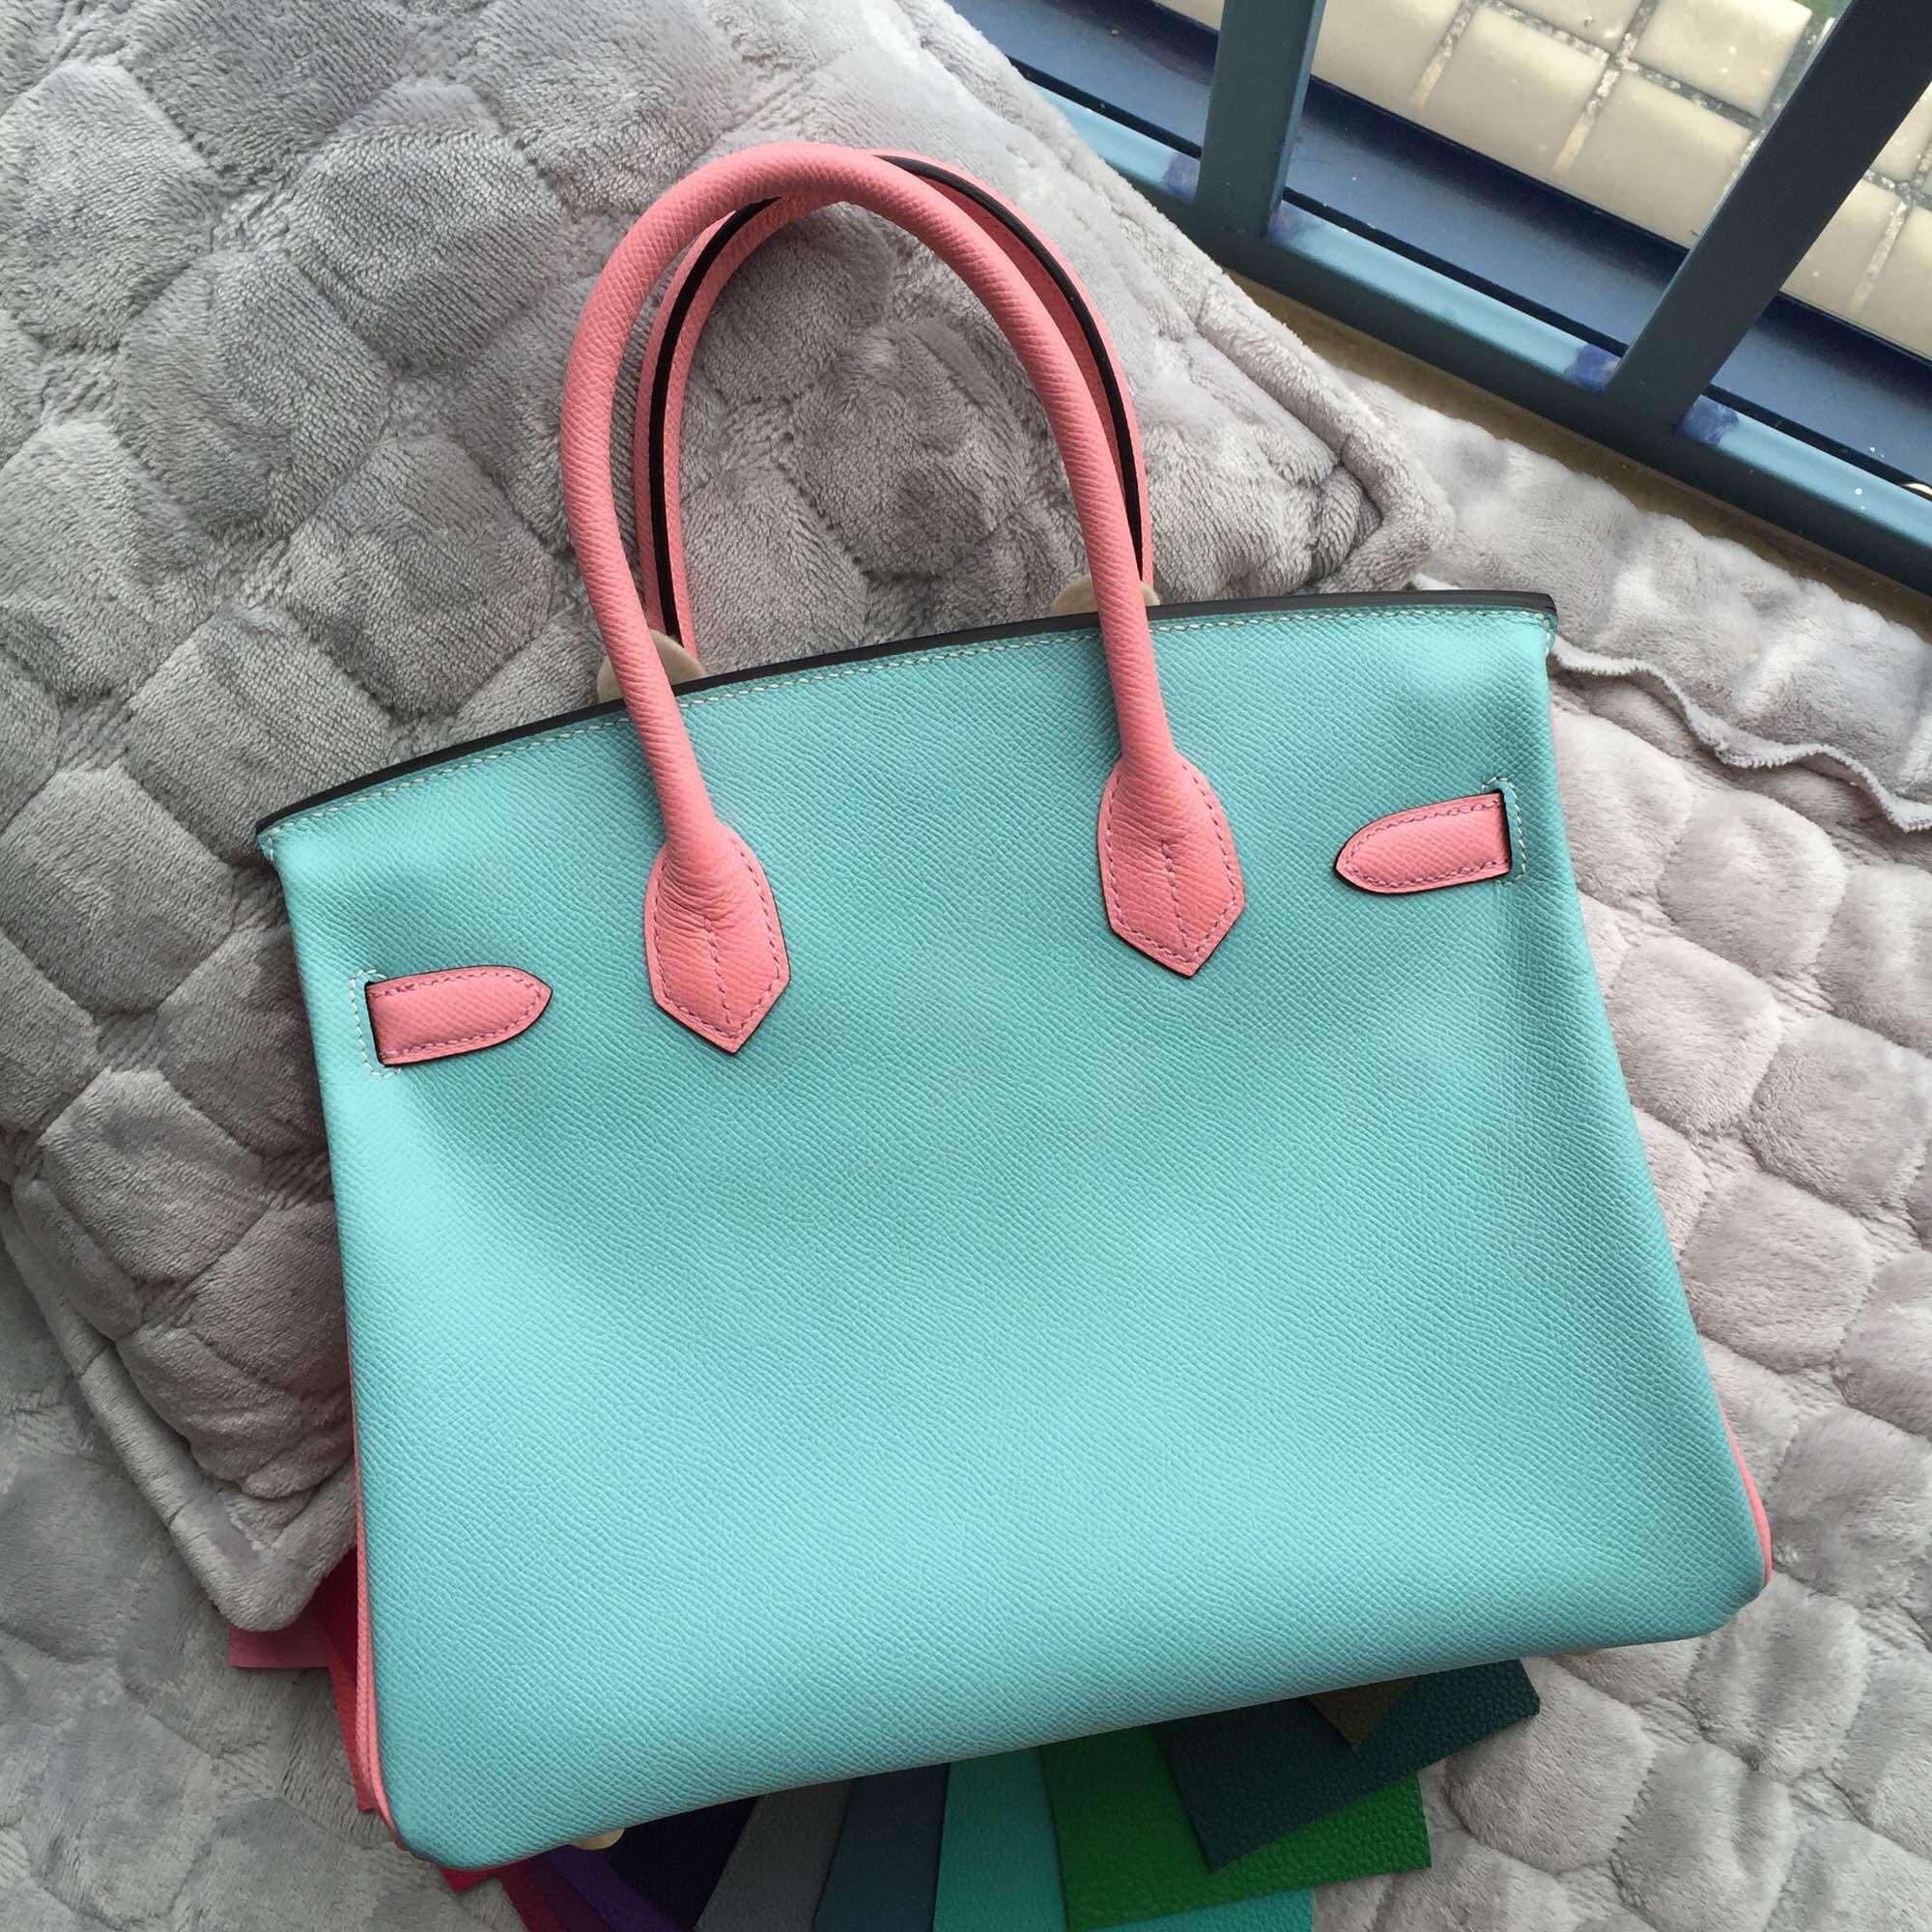 30CM Hermes Birkin Bag C9 Lime Yellow/3P Lagon Blue/1Q Rose Confetti Epsom Leather